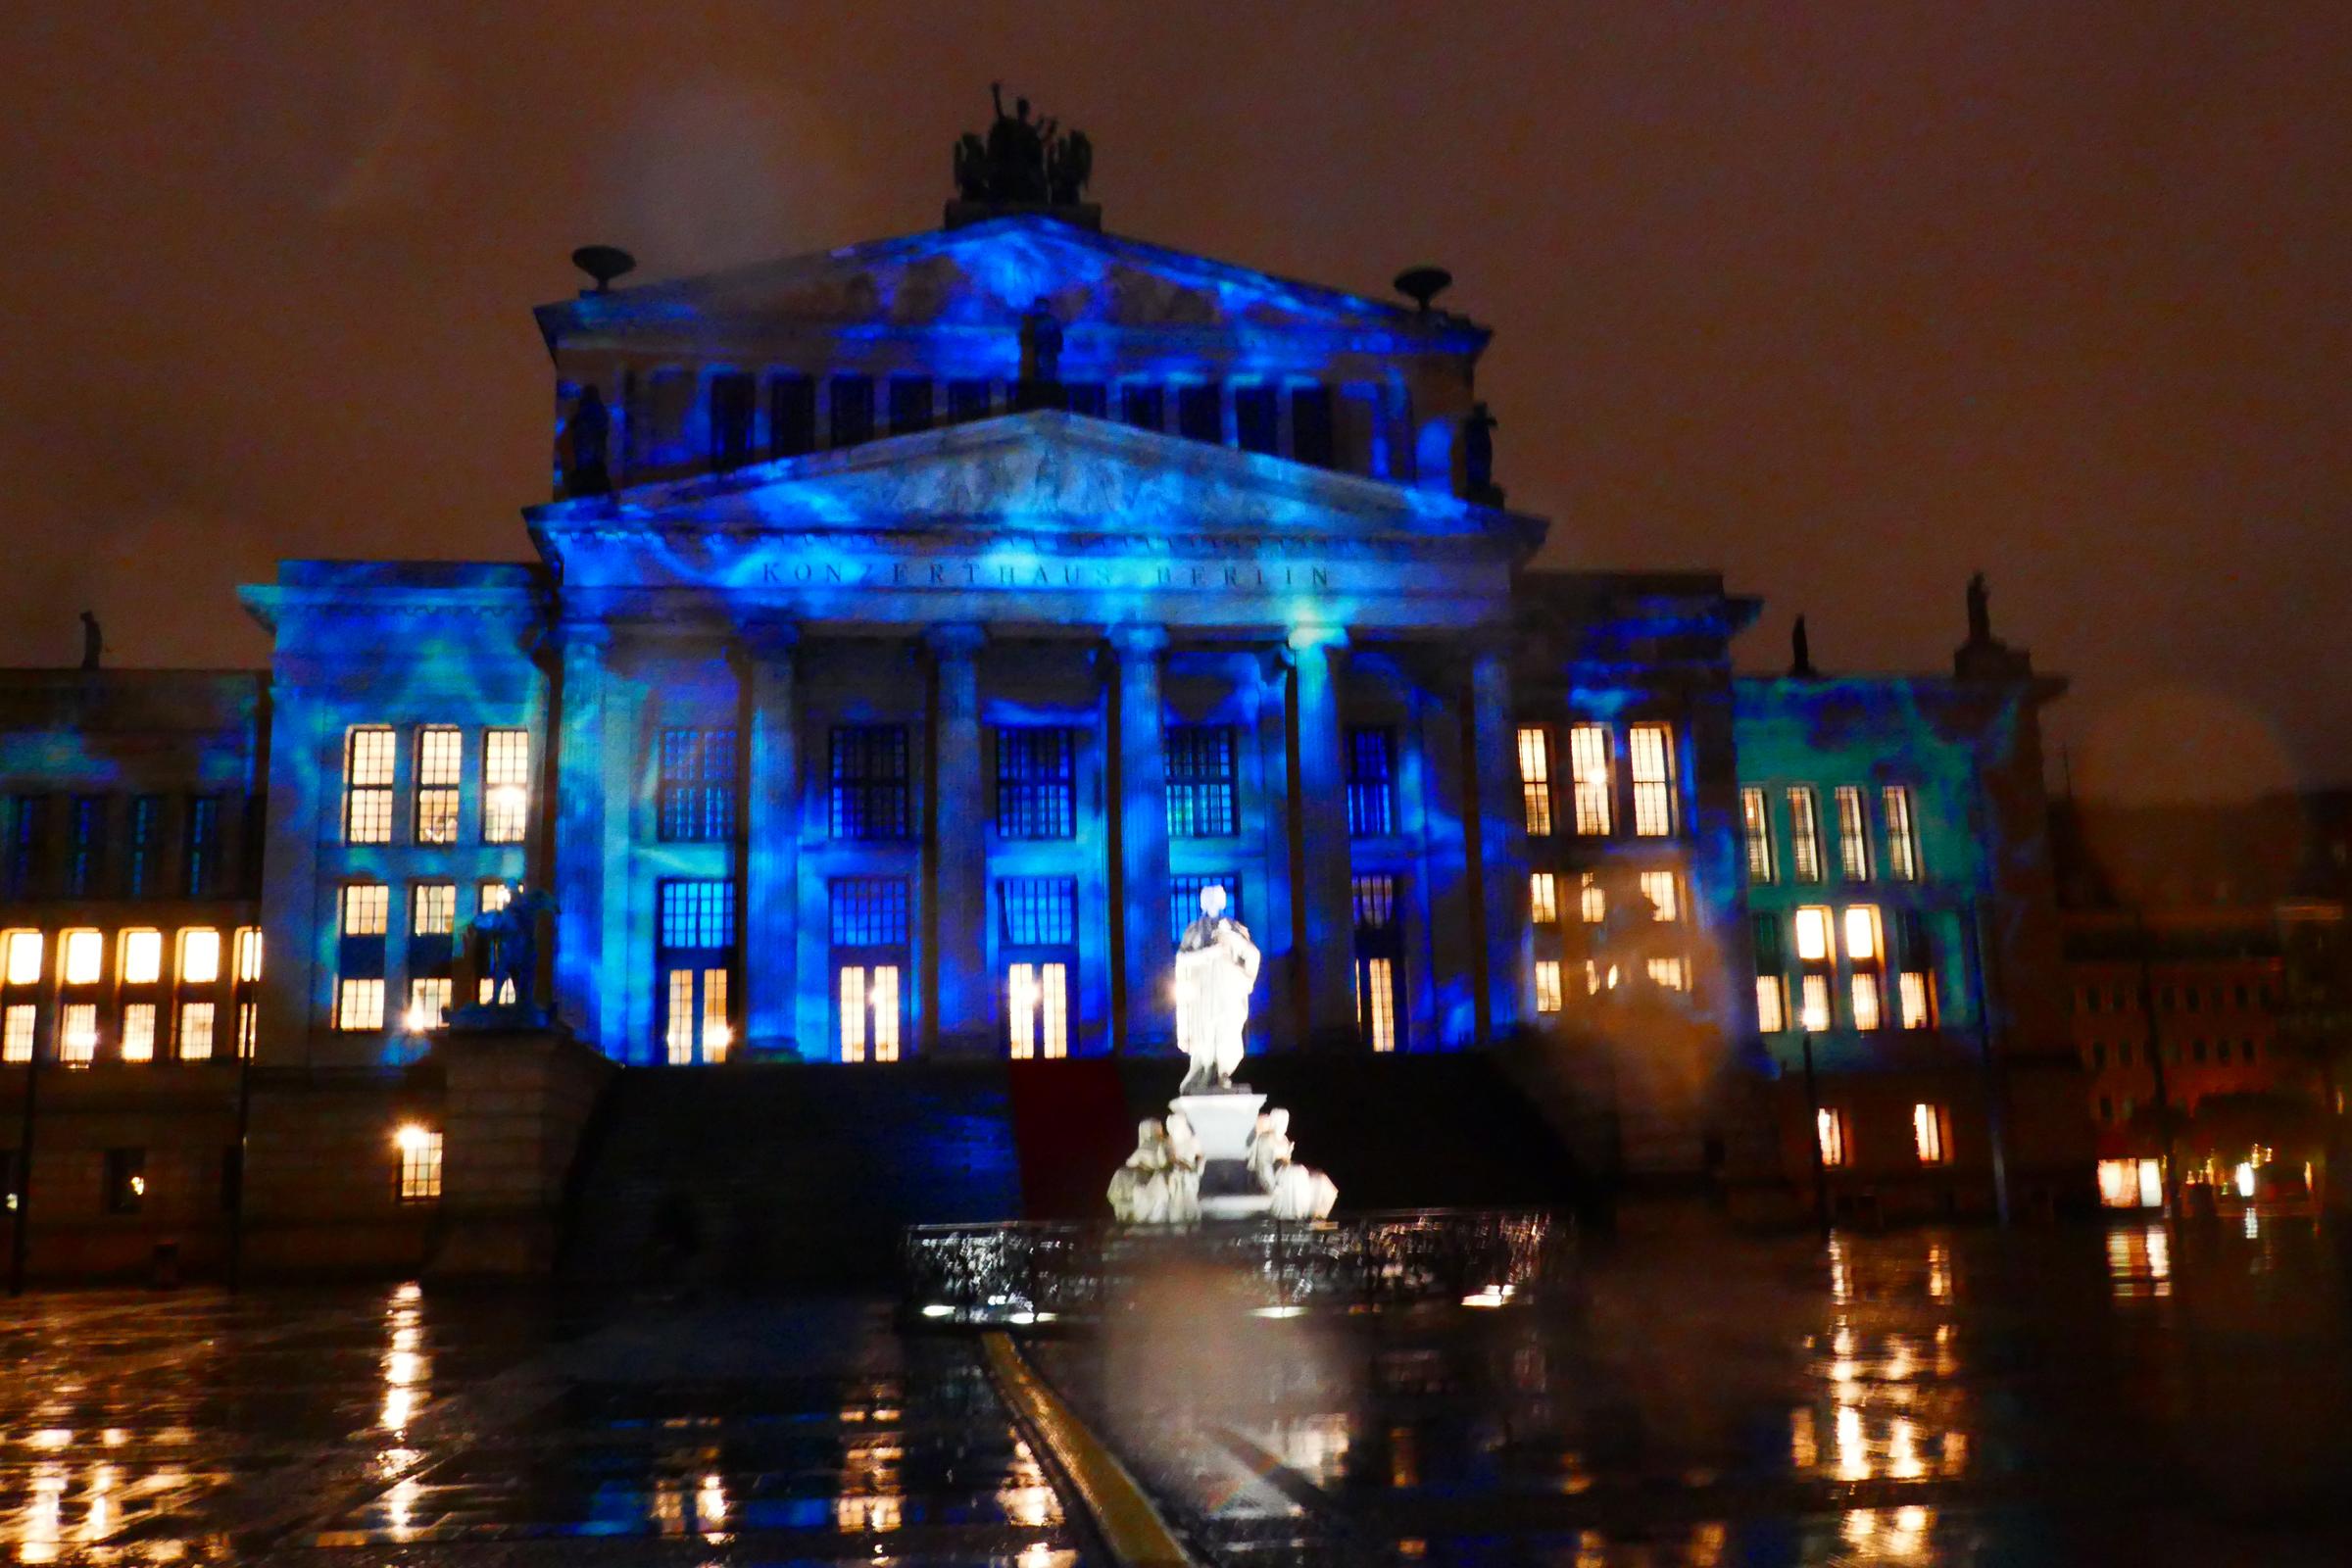 Festival of Lights 2017: Gendarmenmarkt. Foto: Ulrich Horb